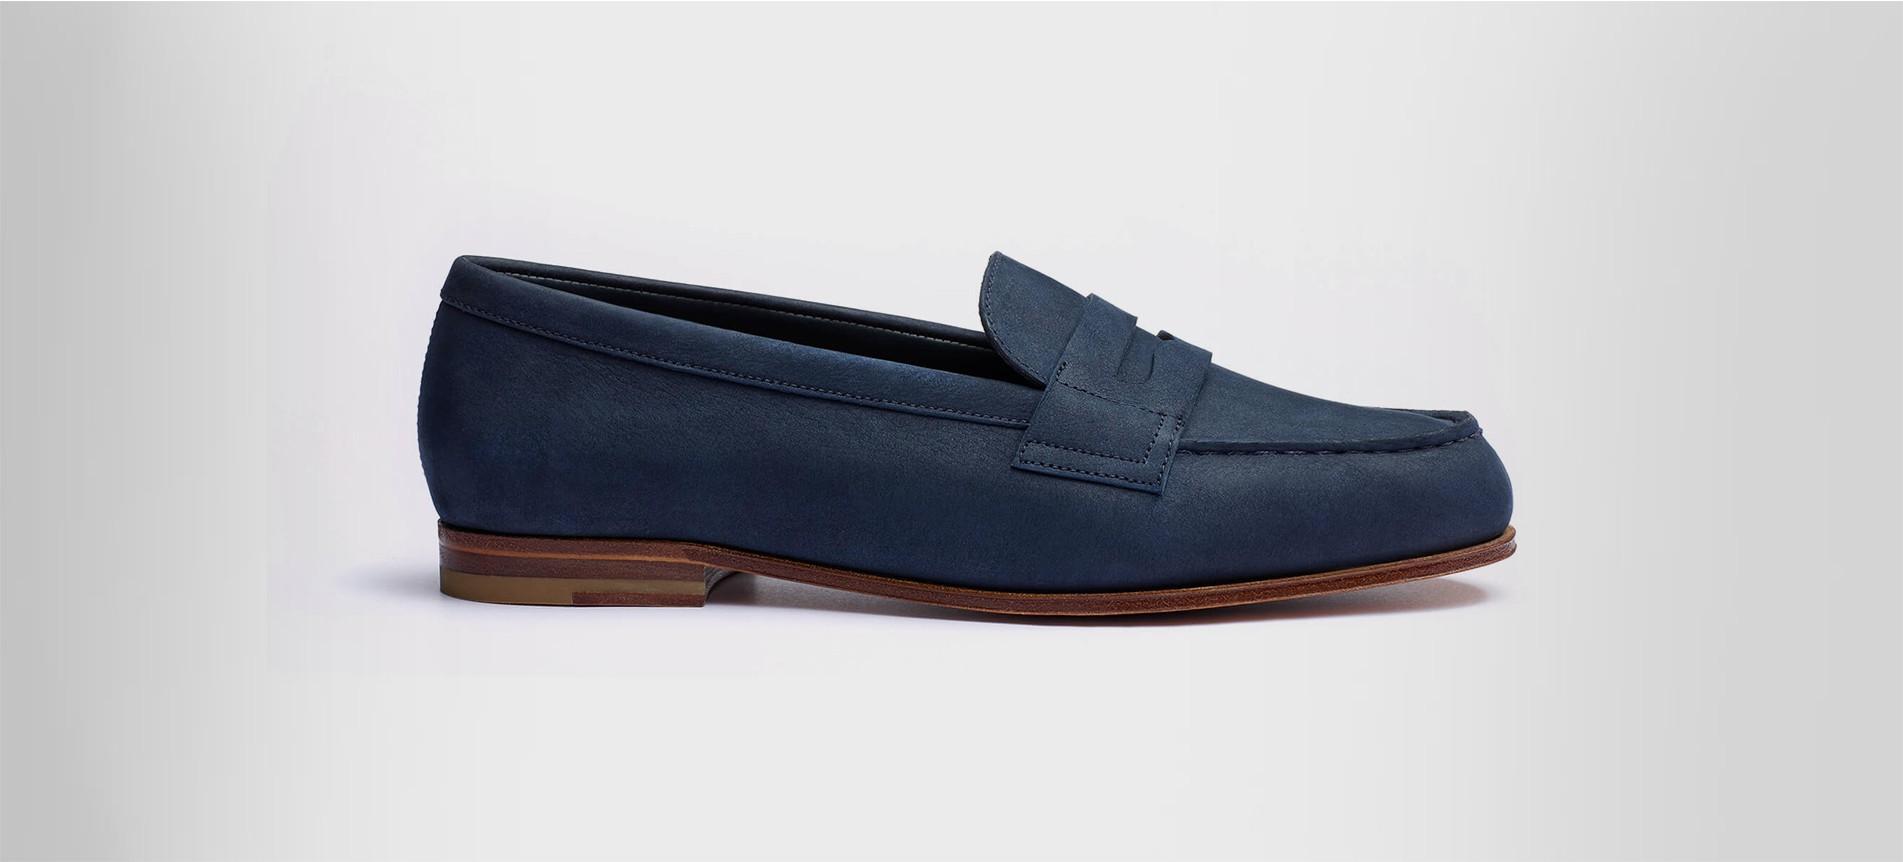 Le Moc' Navy blue nubuck - Loafers J.M